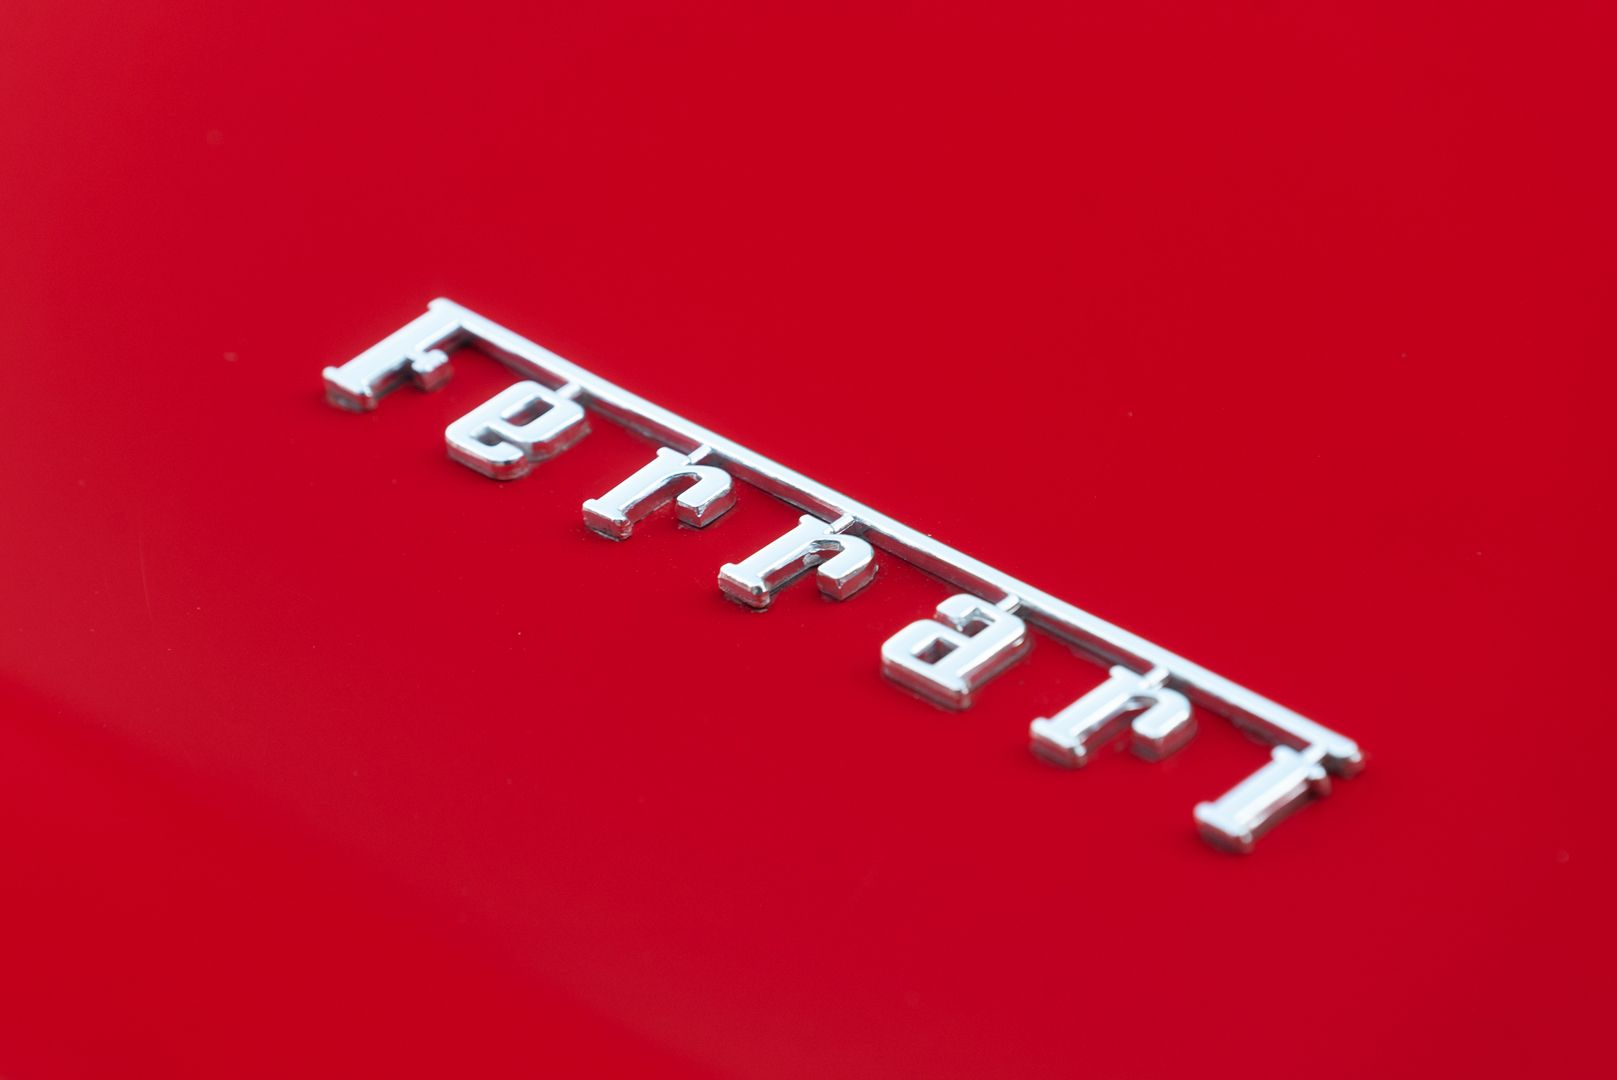 1988 FERRARI 208 GTS TURBO INTERCOOLER 75419